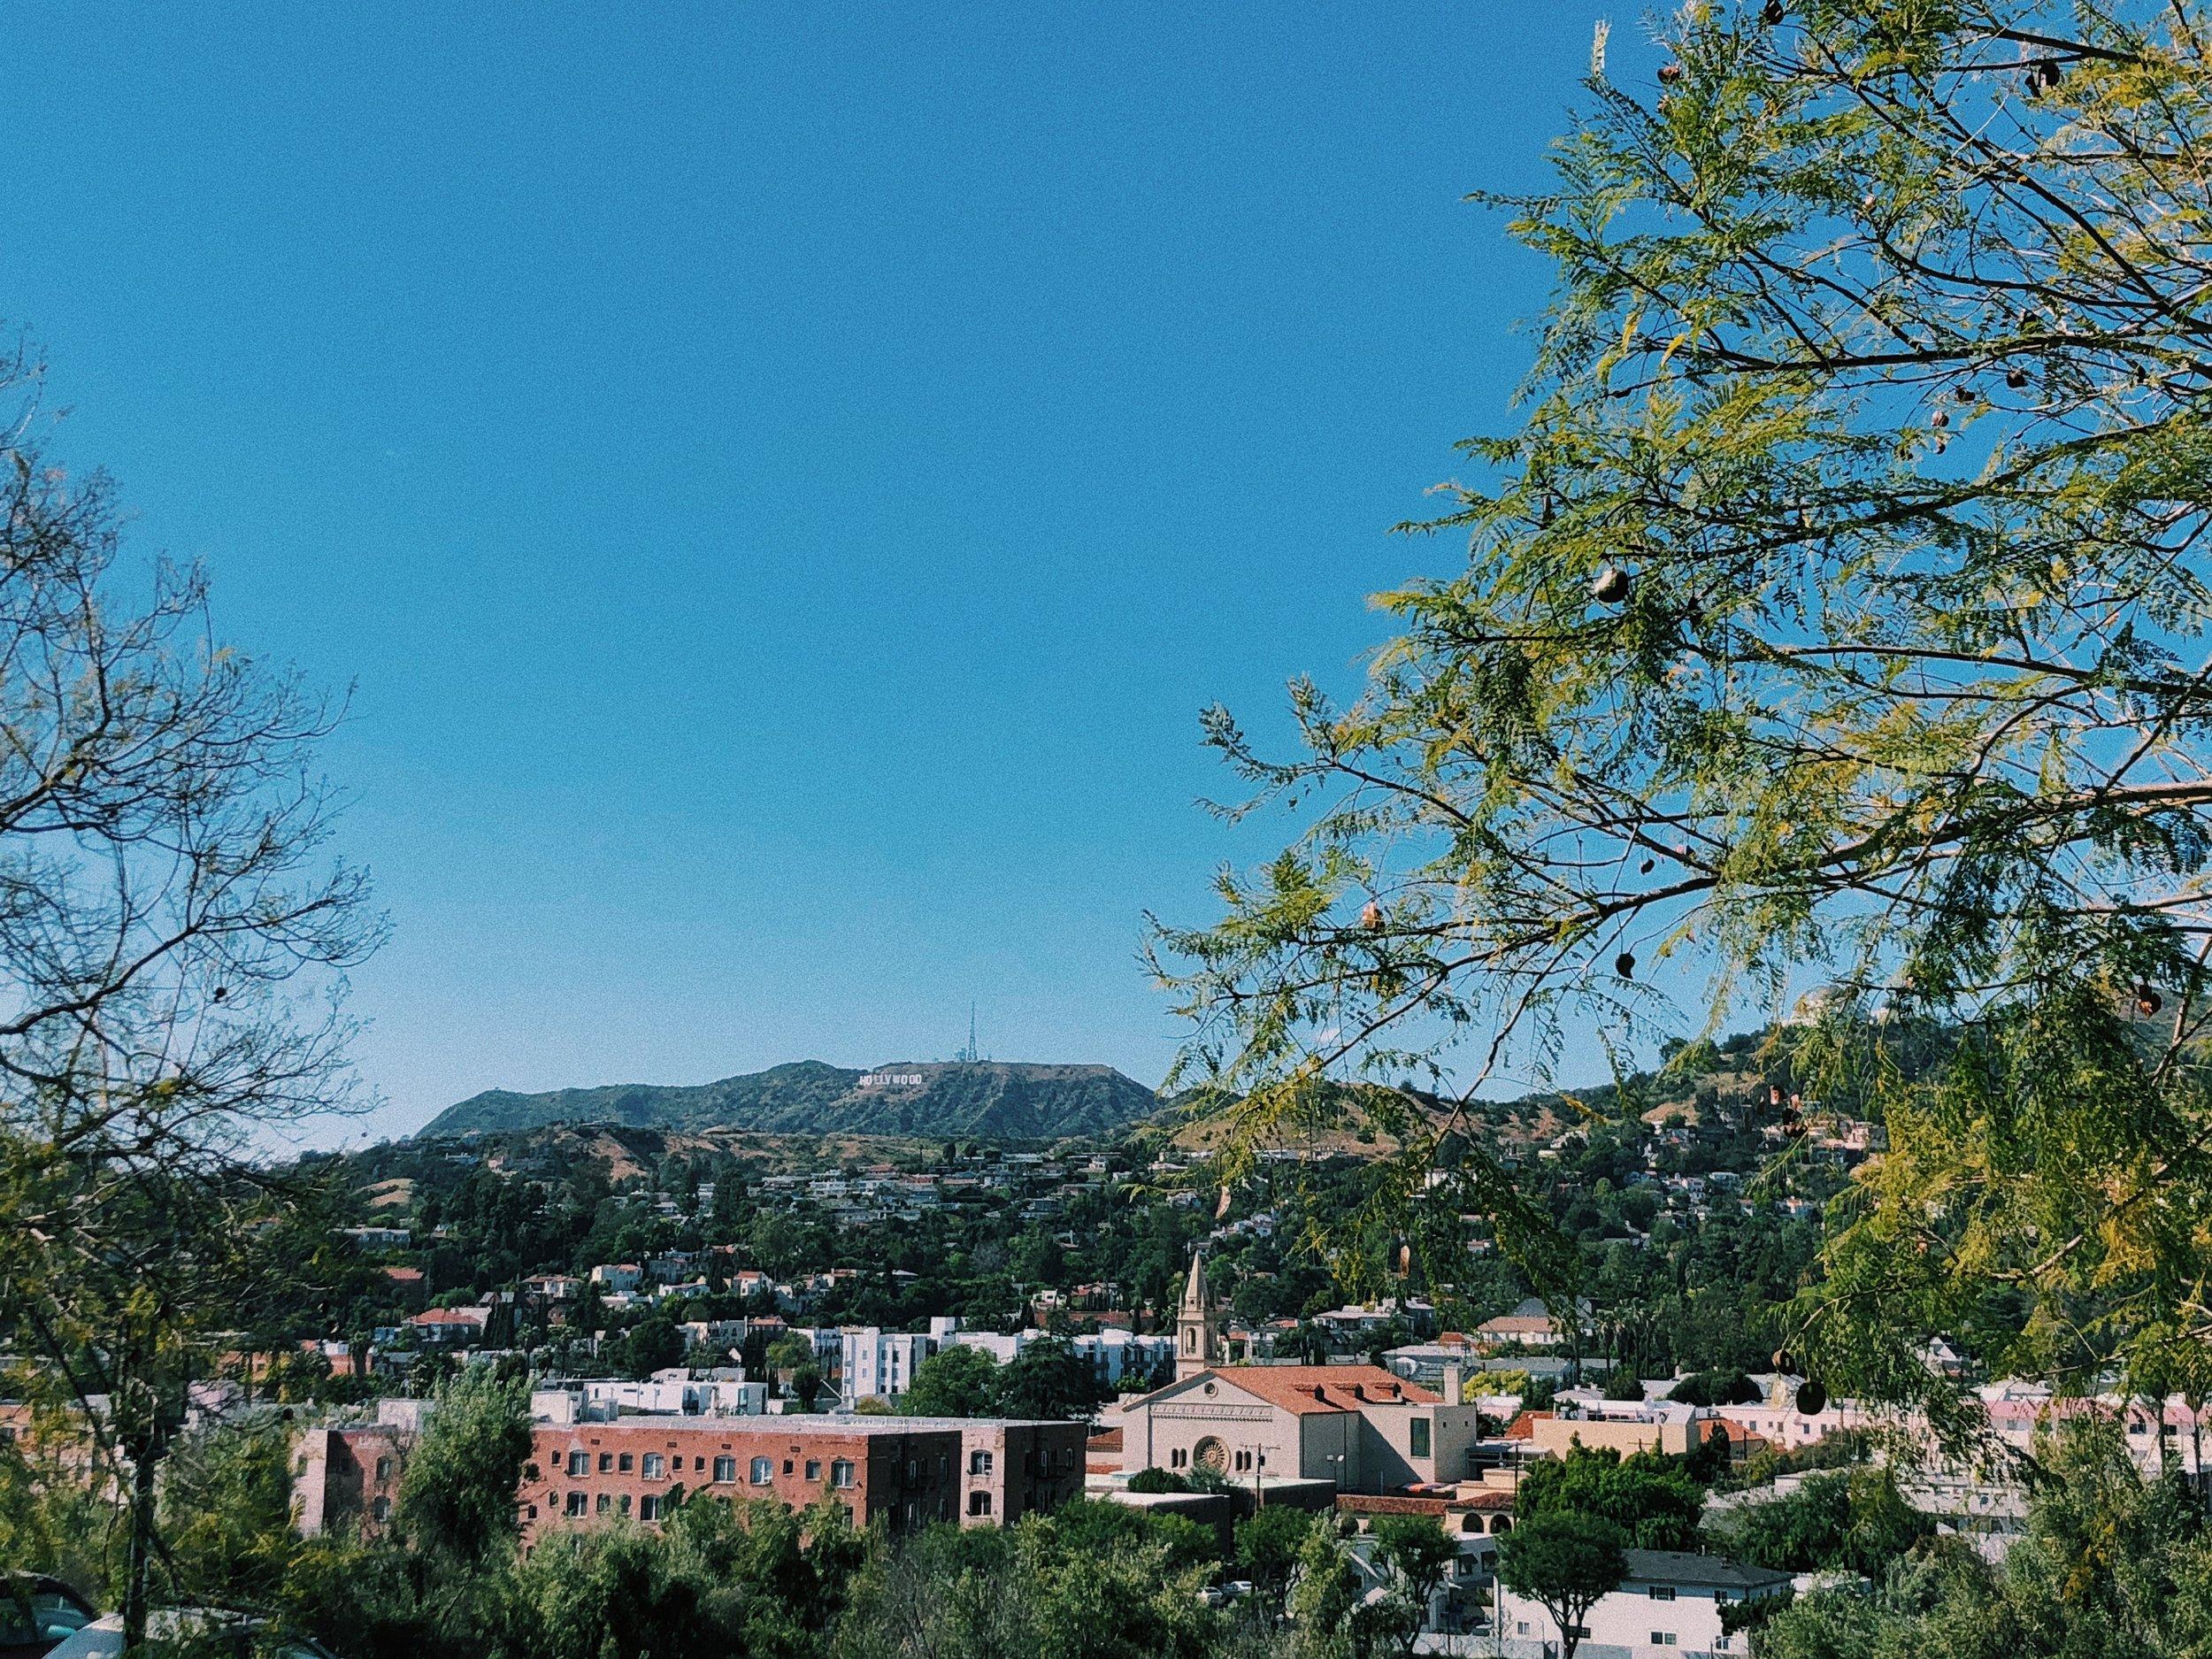 Day 11 –Los Feliz - The relaxed side of LA